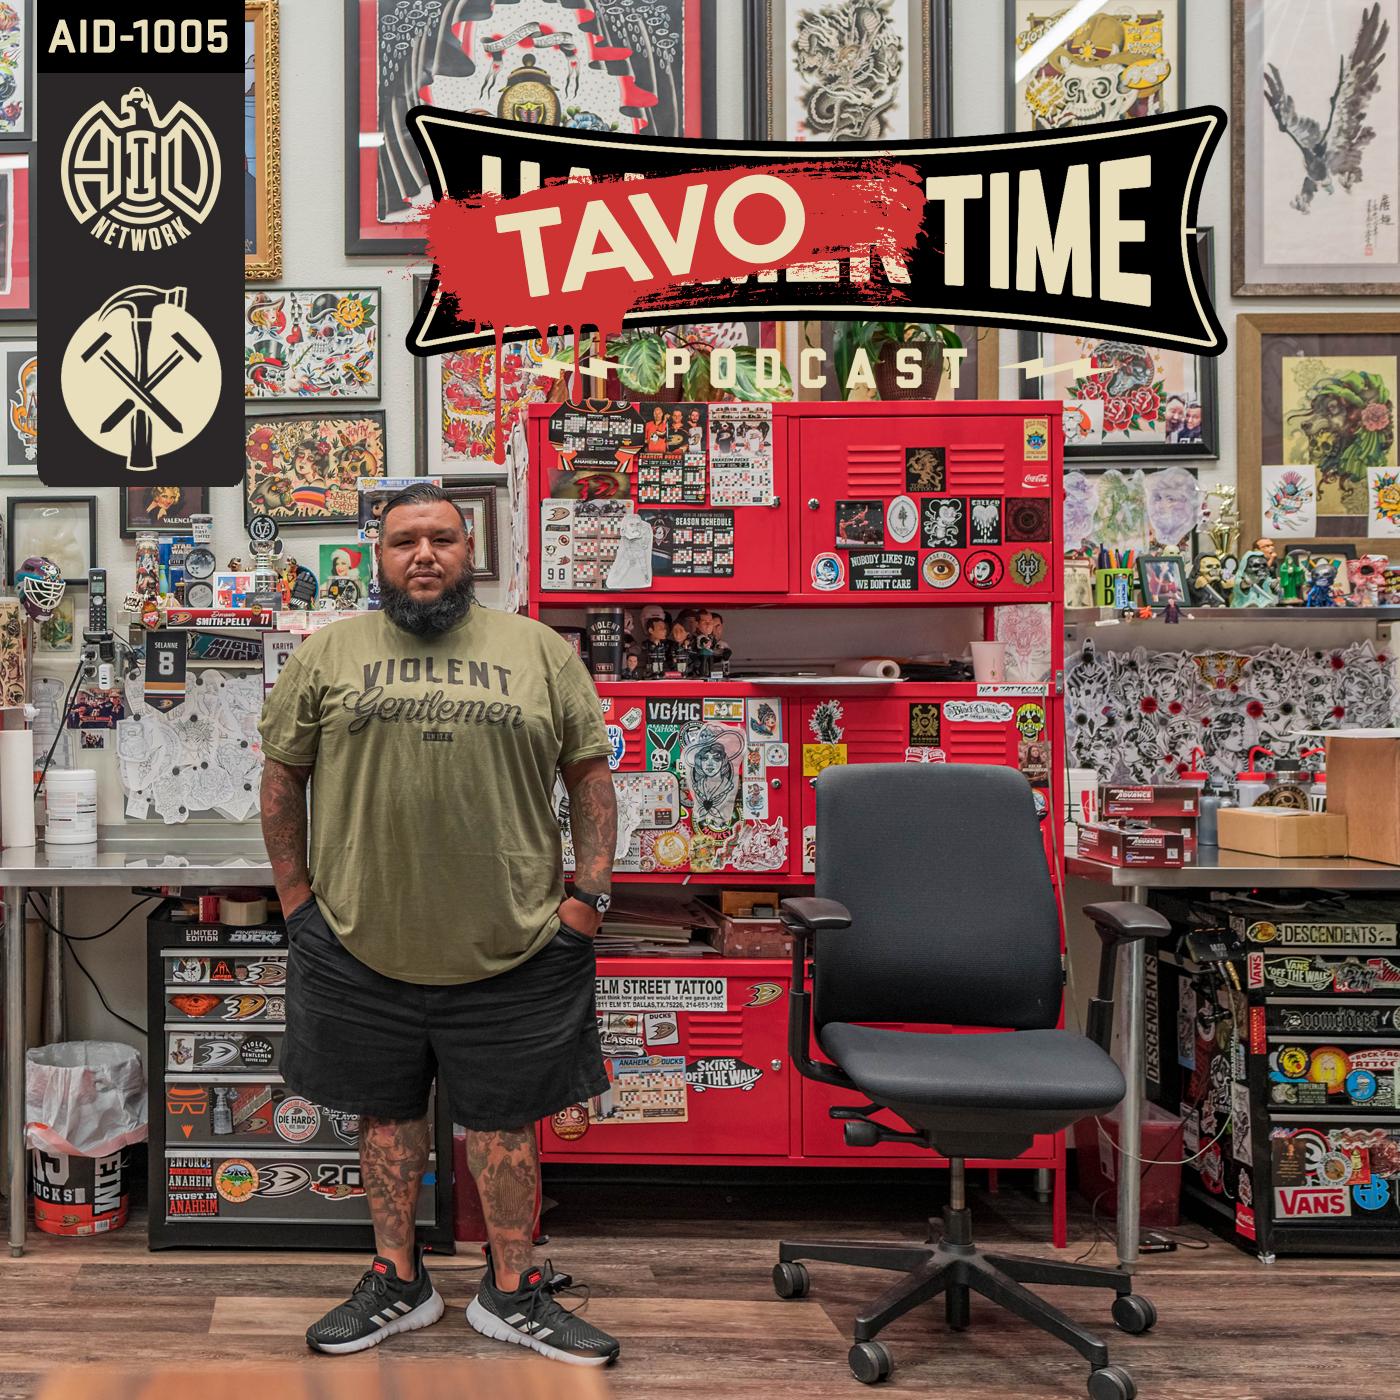 Tattoo Artist Gustavo Jaimes - Hammer Time 86 show art